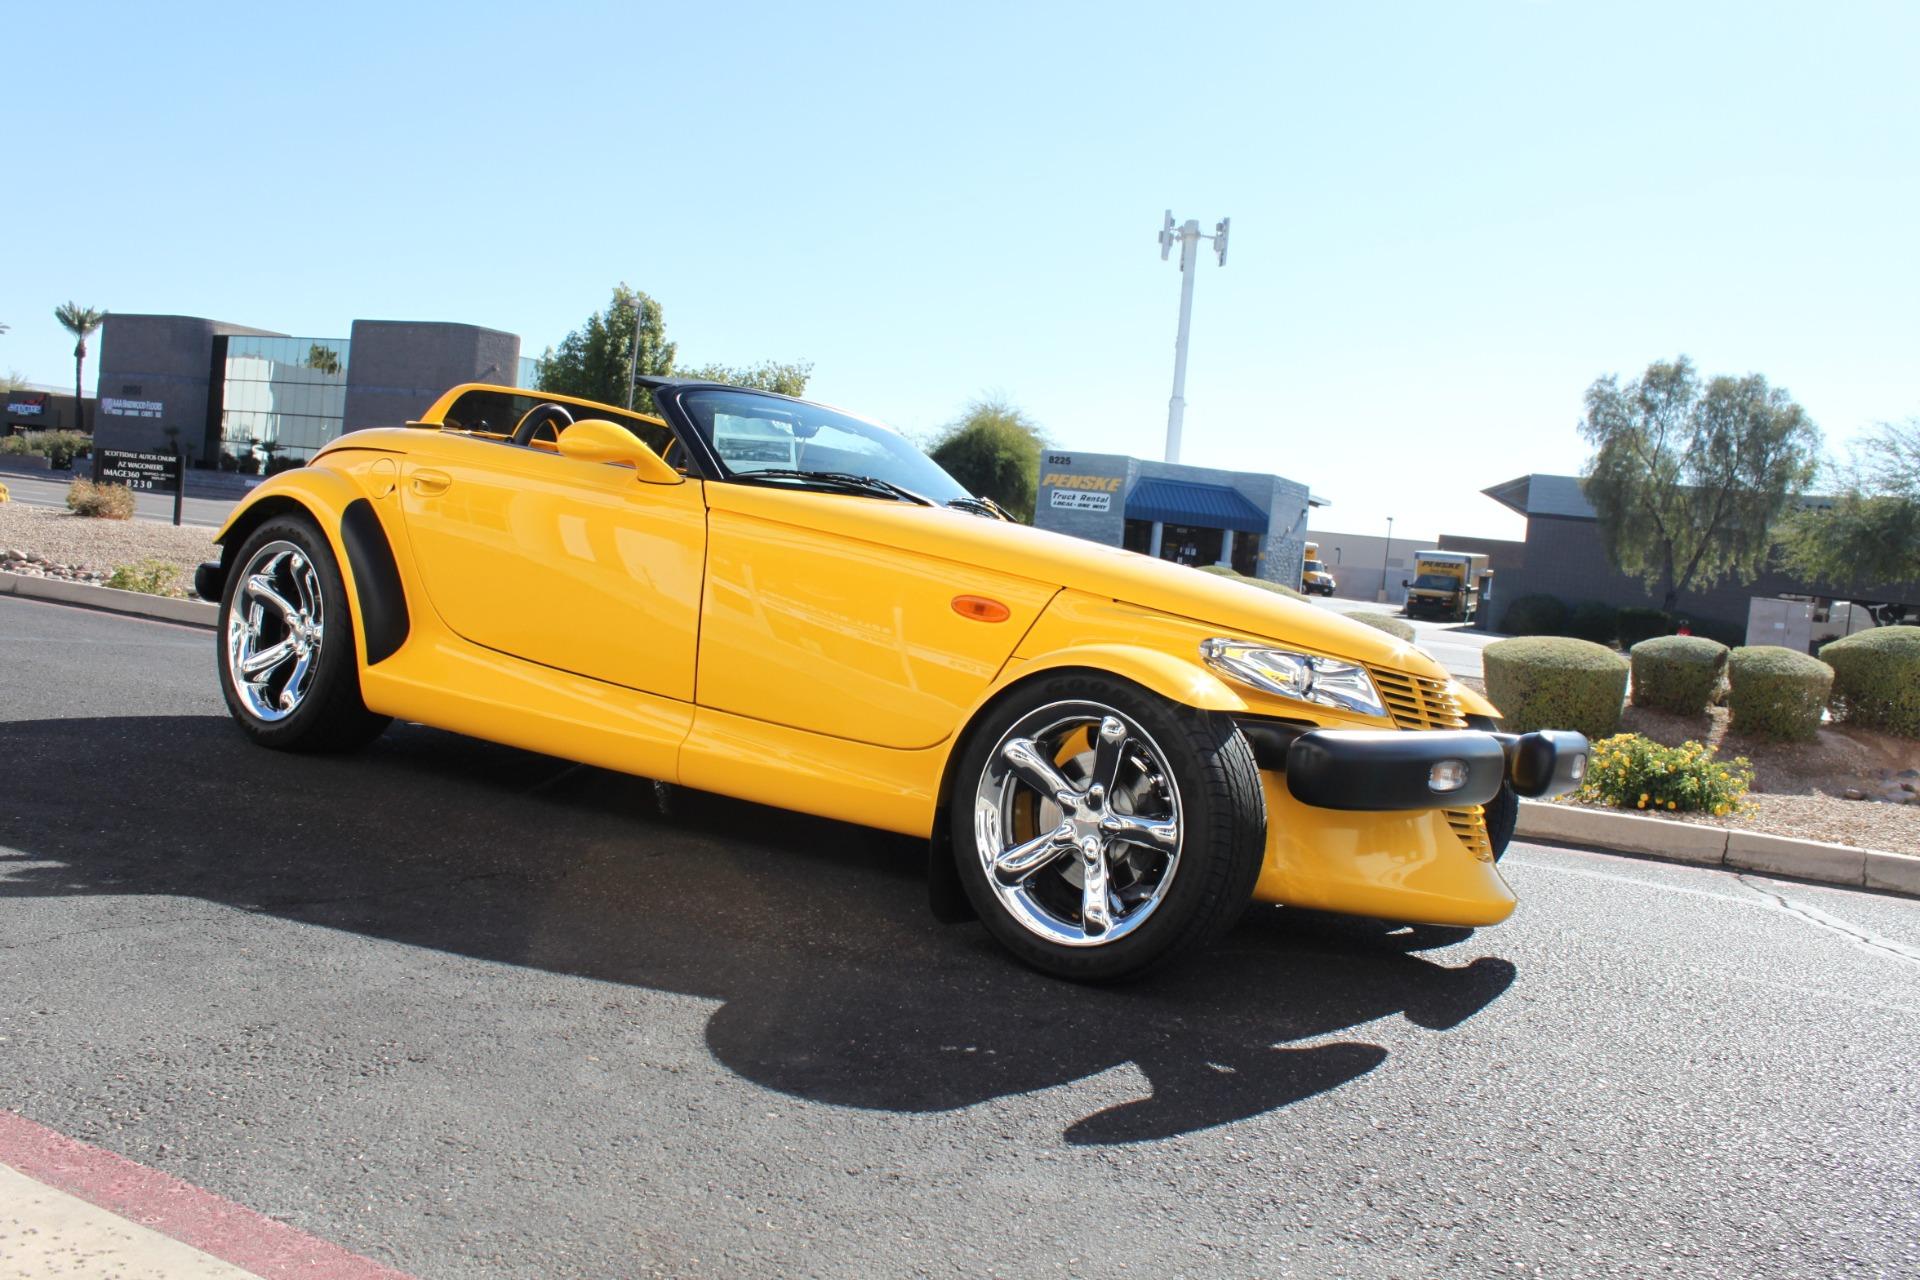 Used-2002-Chrysler-Prowler-Alfa-Romeo